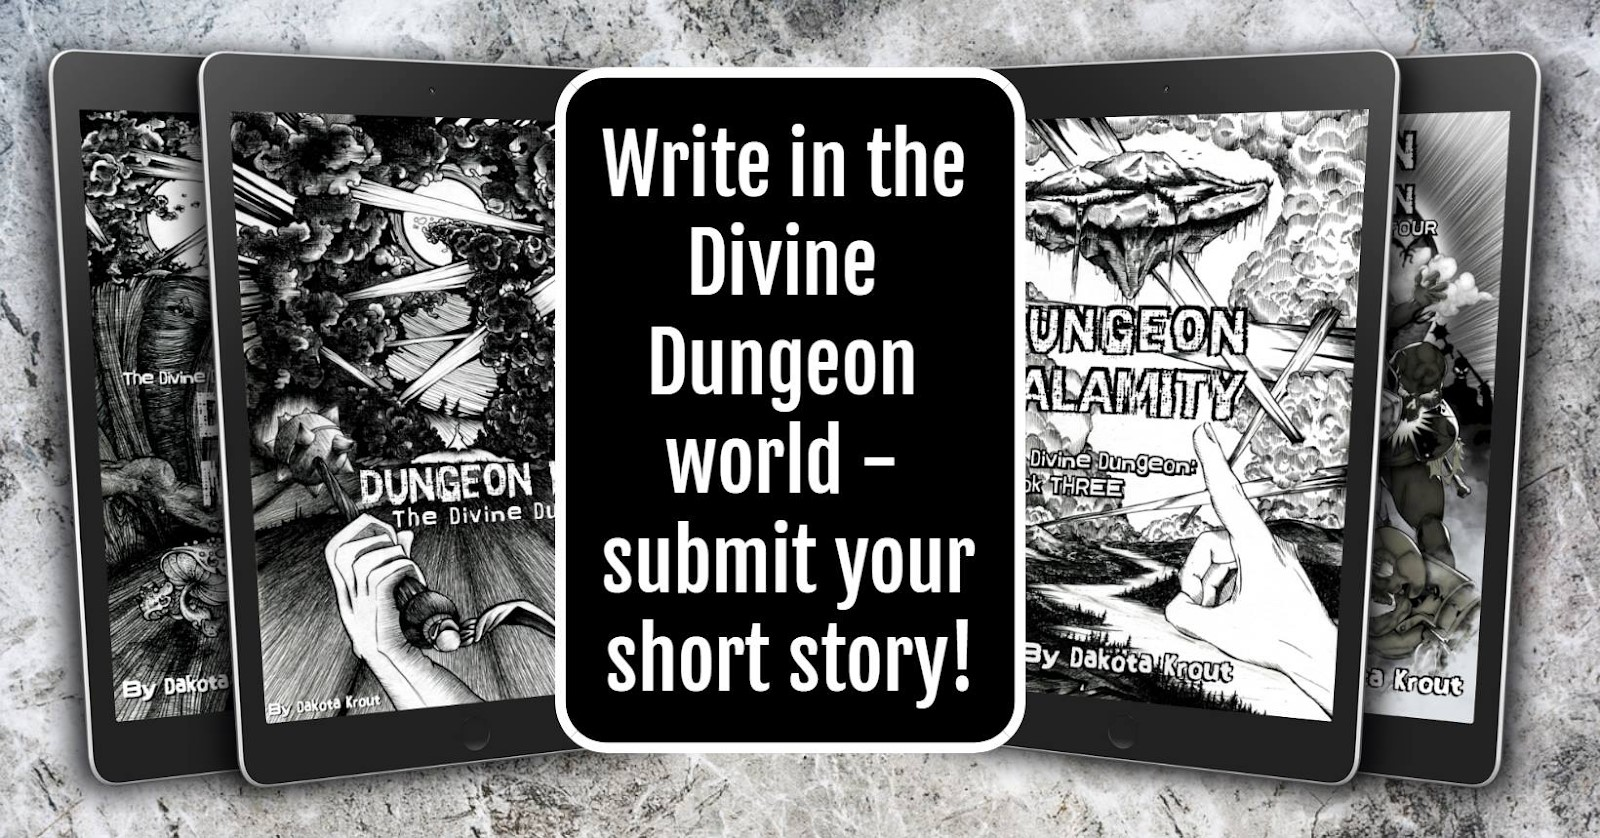 DivineDungeonSubmissions.jpg